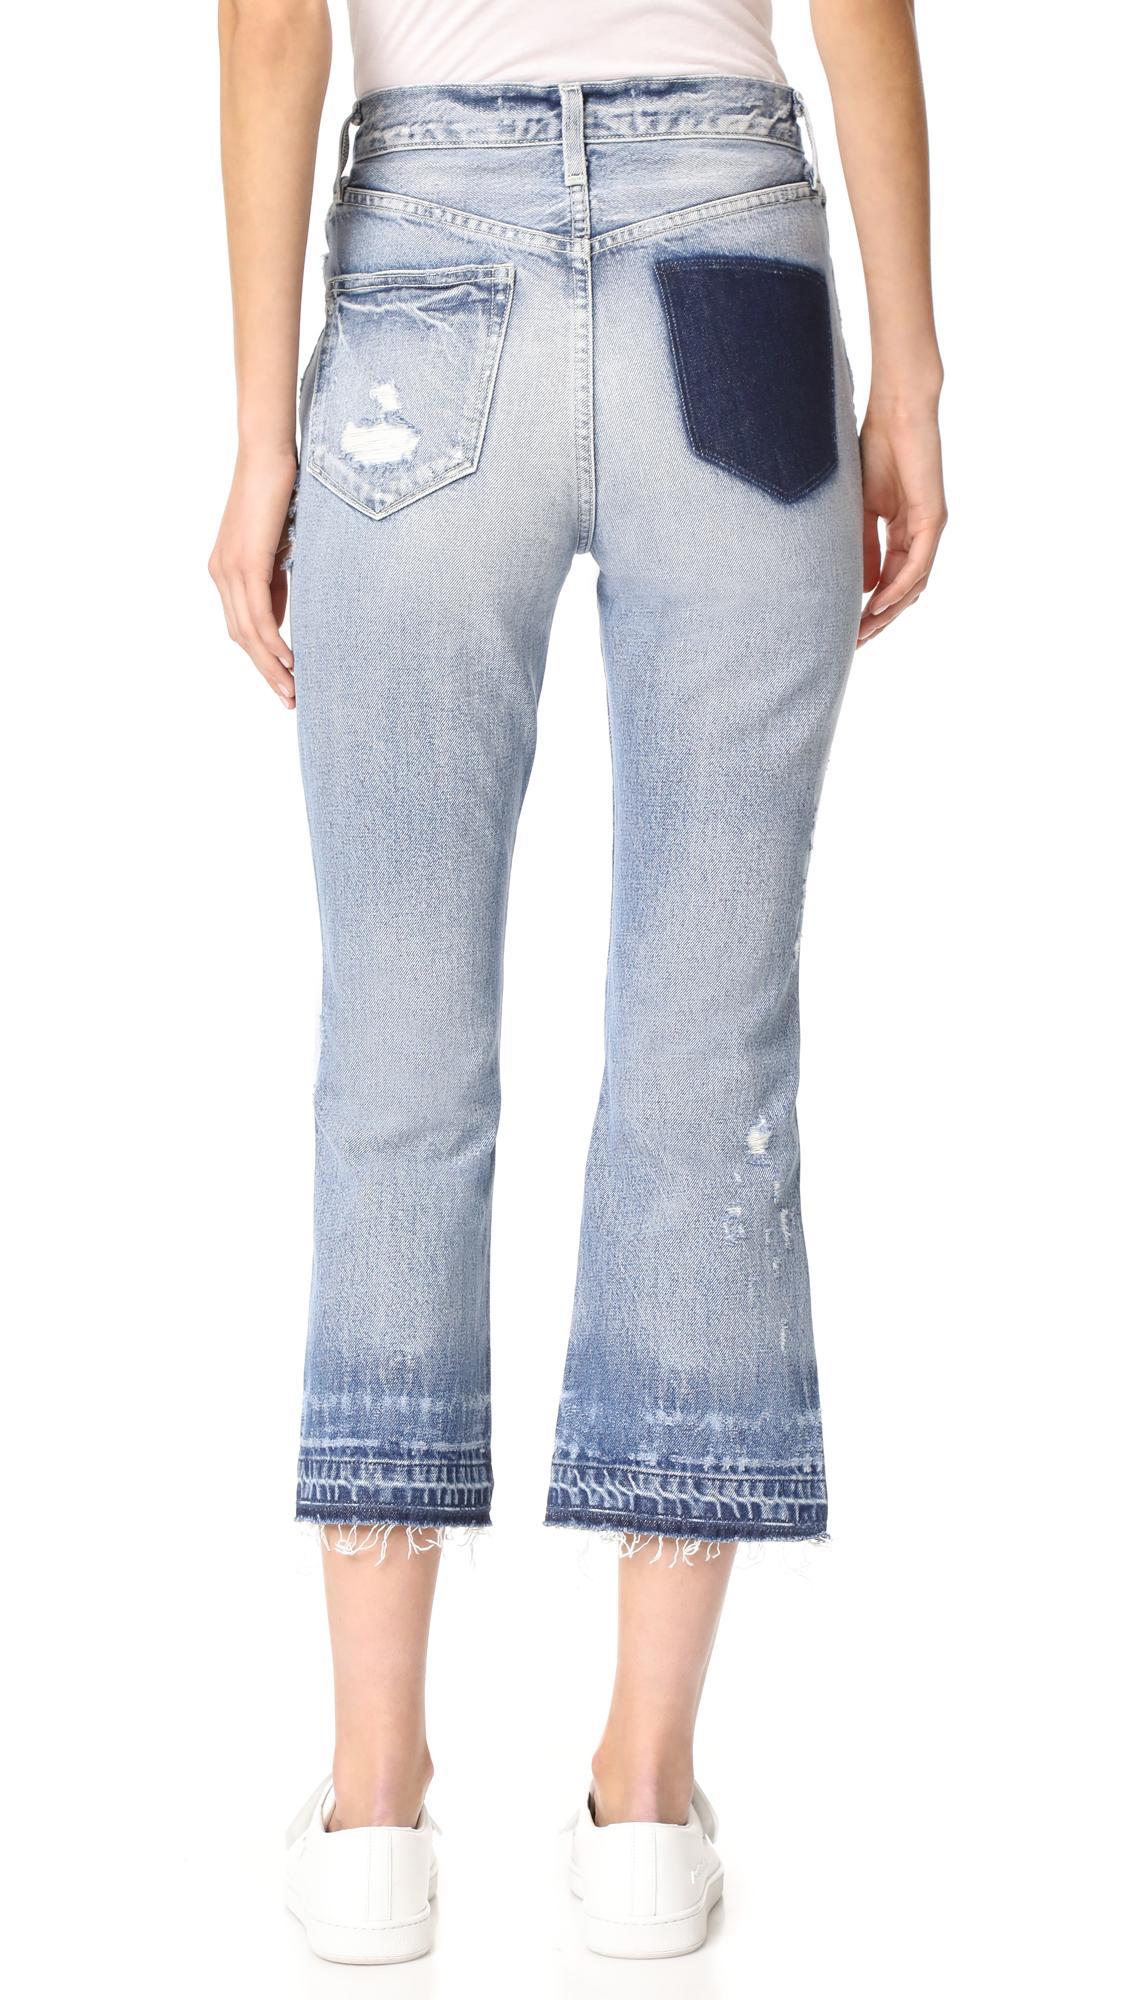 Ayr Denim The Styx Jeans in Blue